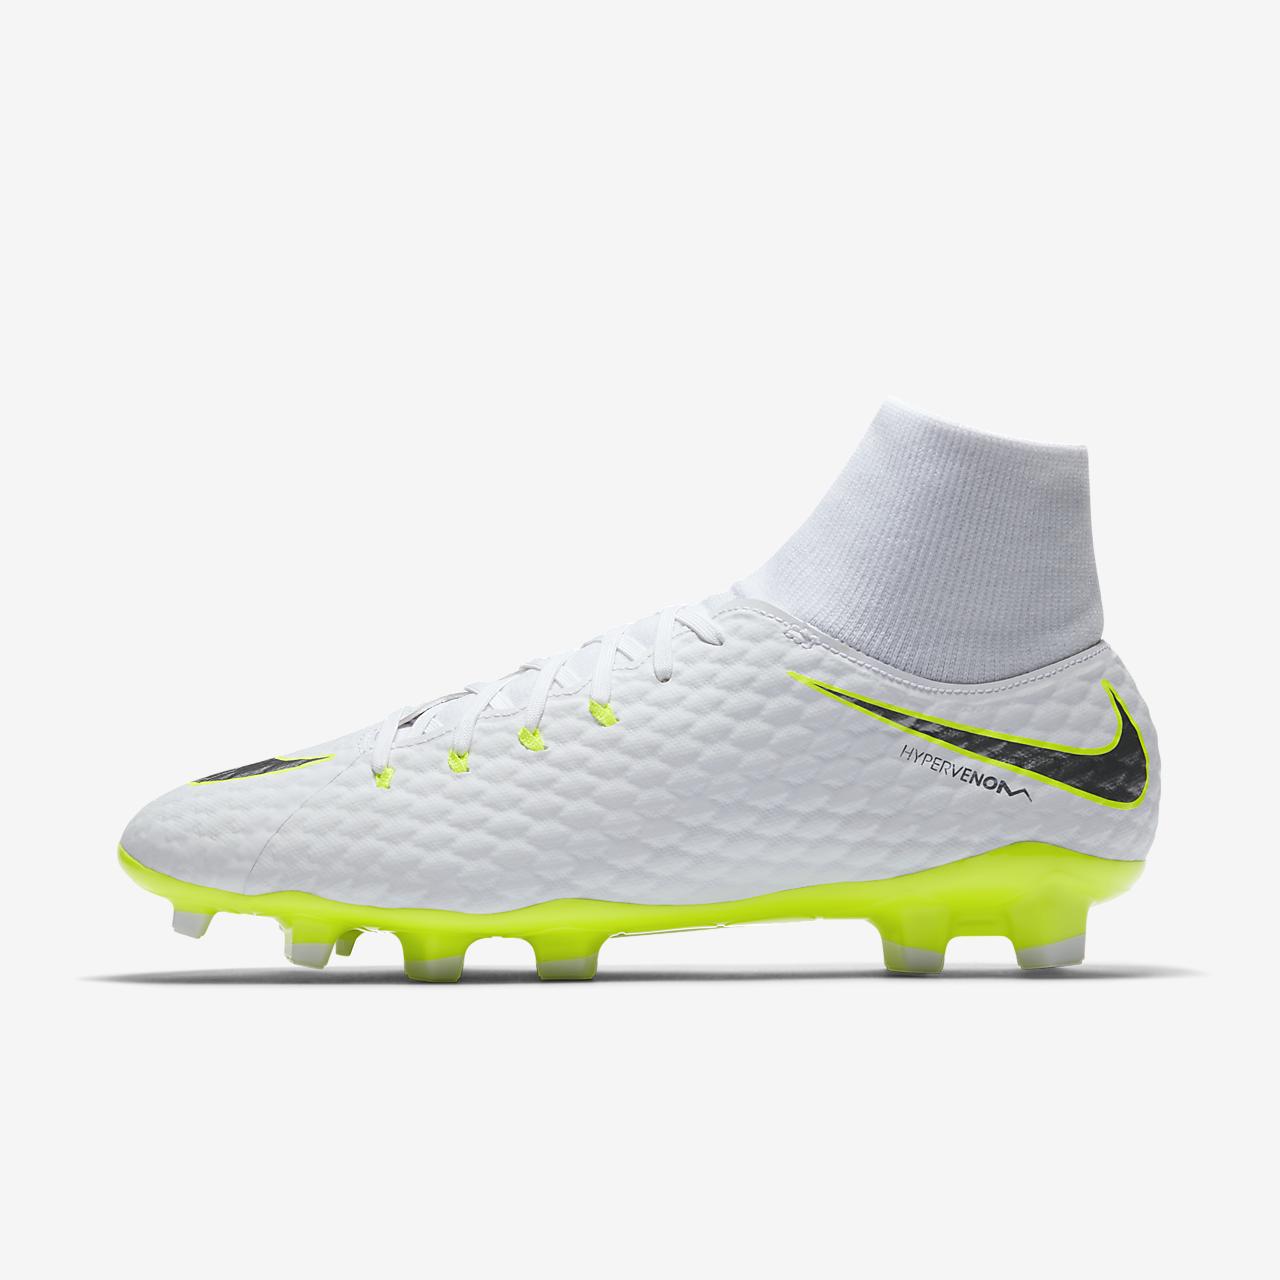 Intuición Plano Antemano  nike mercurial superfly VI Nike football boots Pinterest